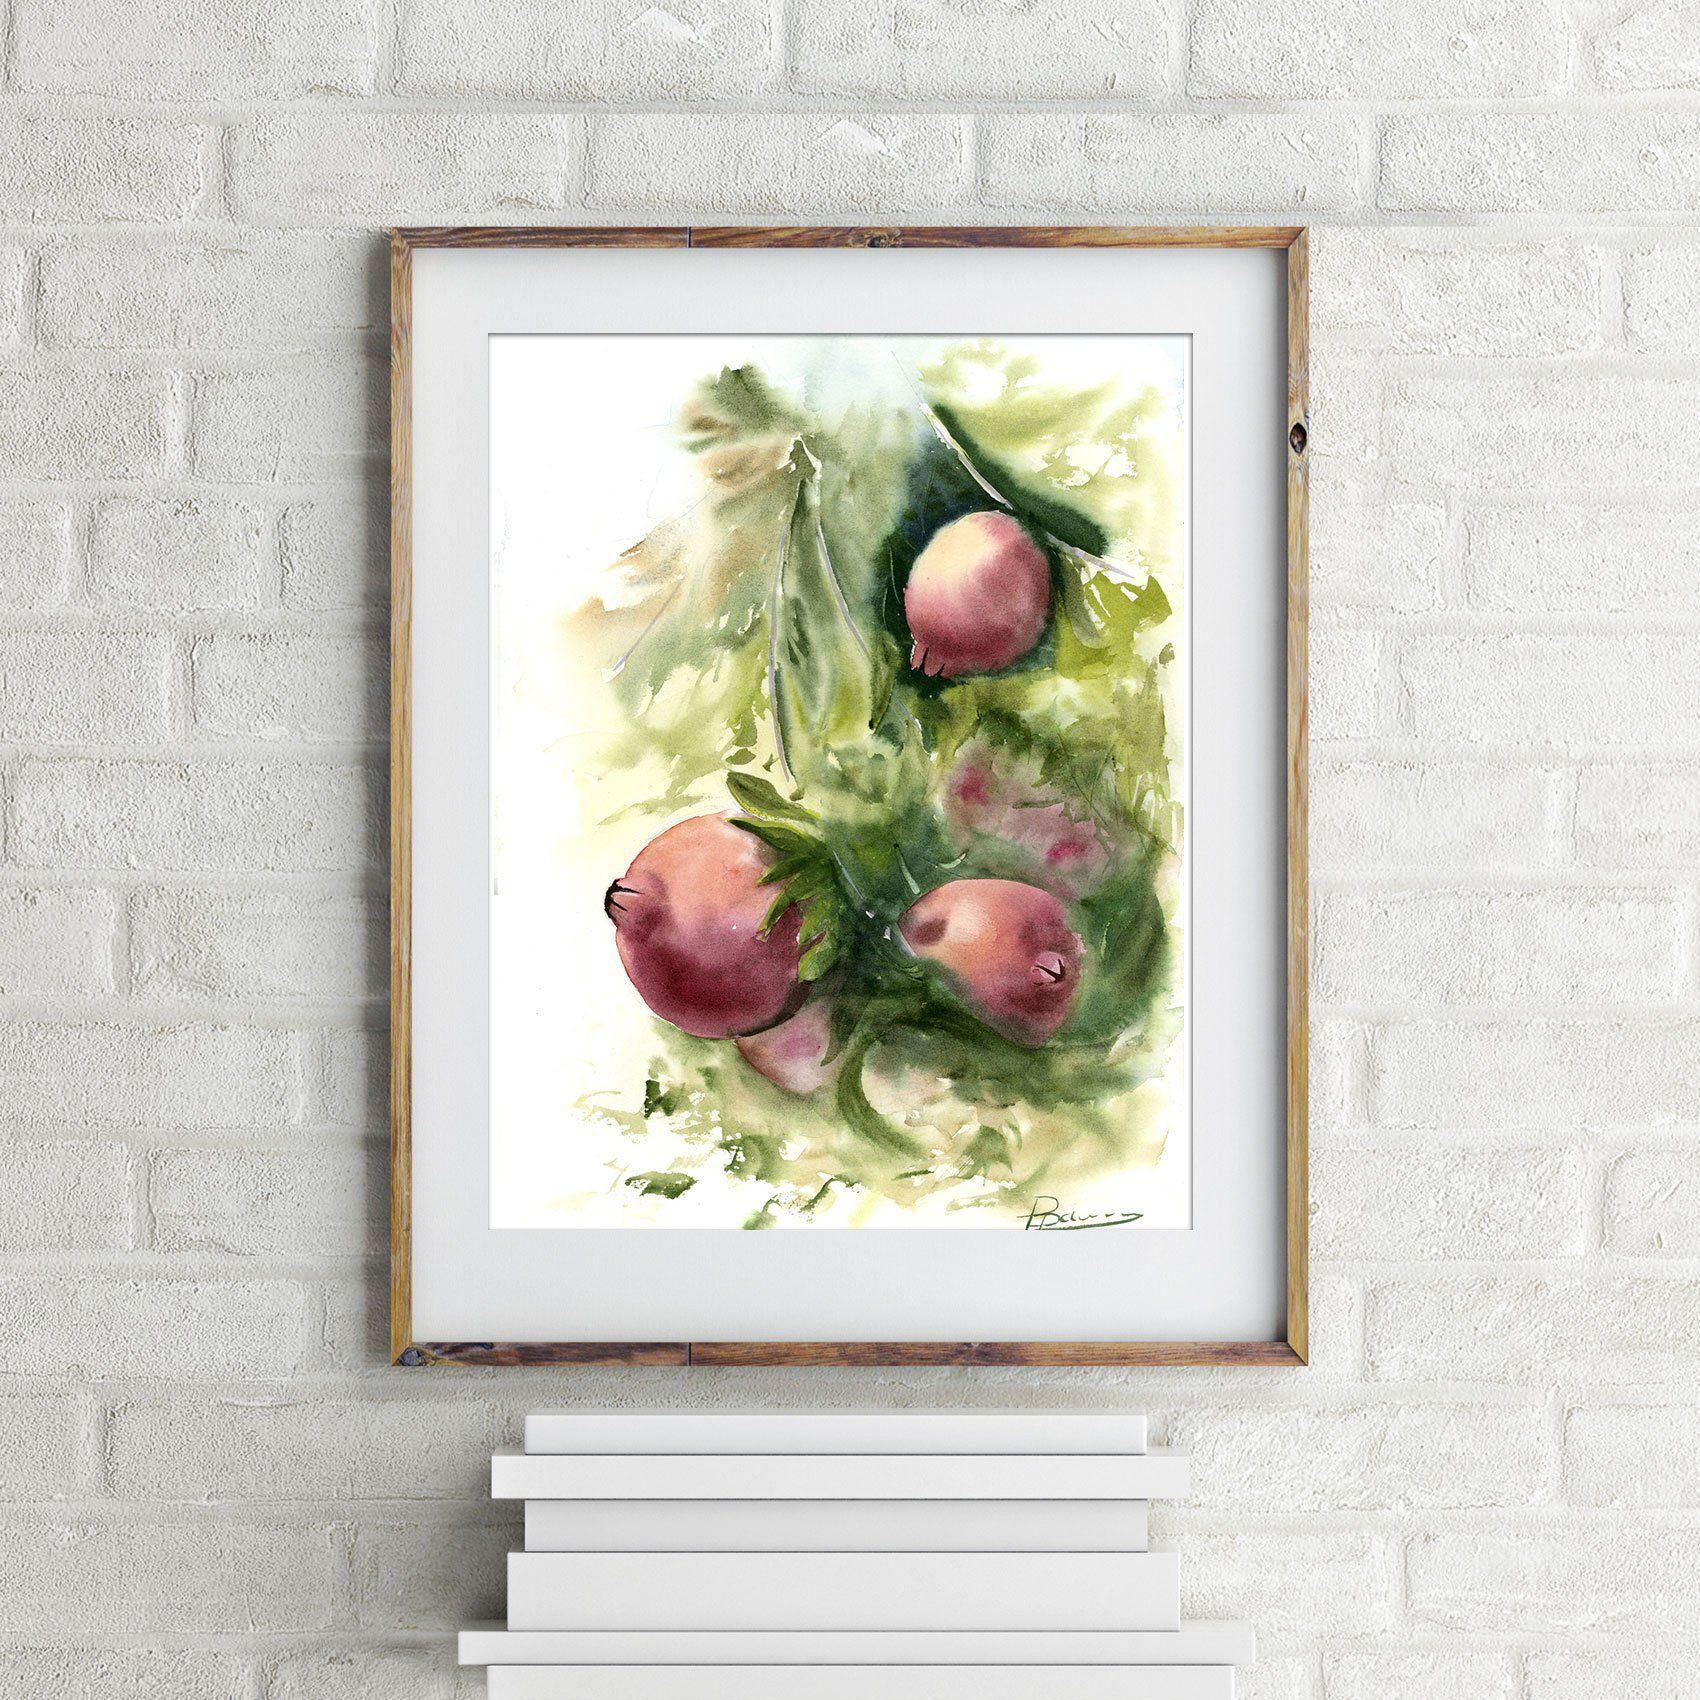 Pomegranate art original watercolor painting fruit artwork kitchen